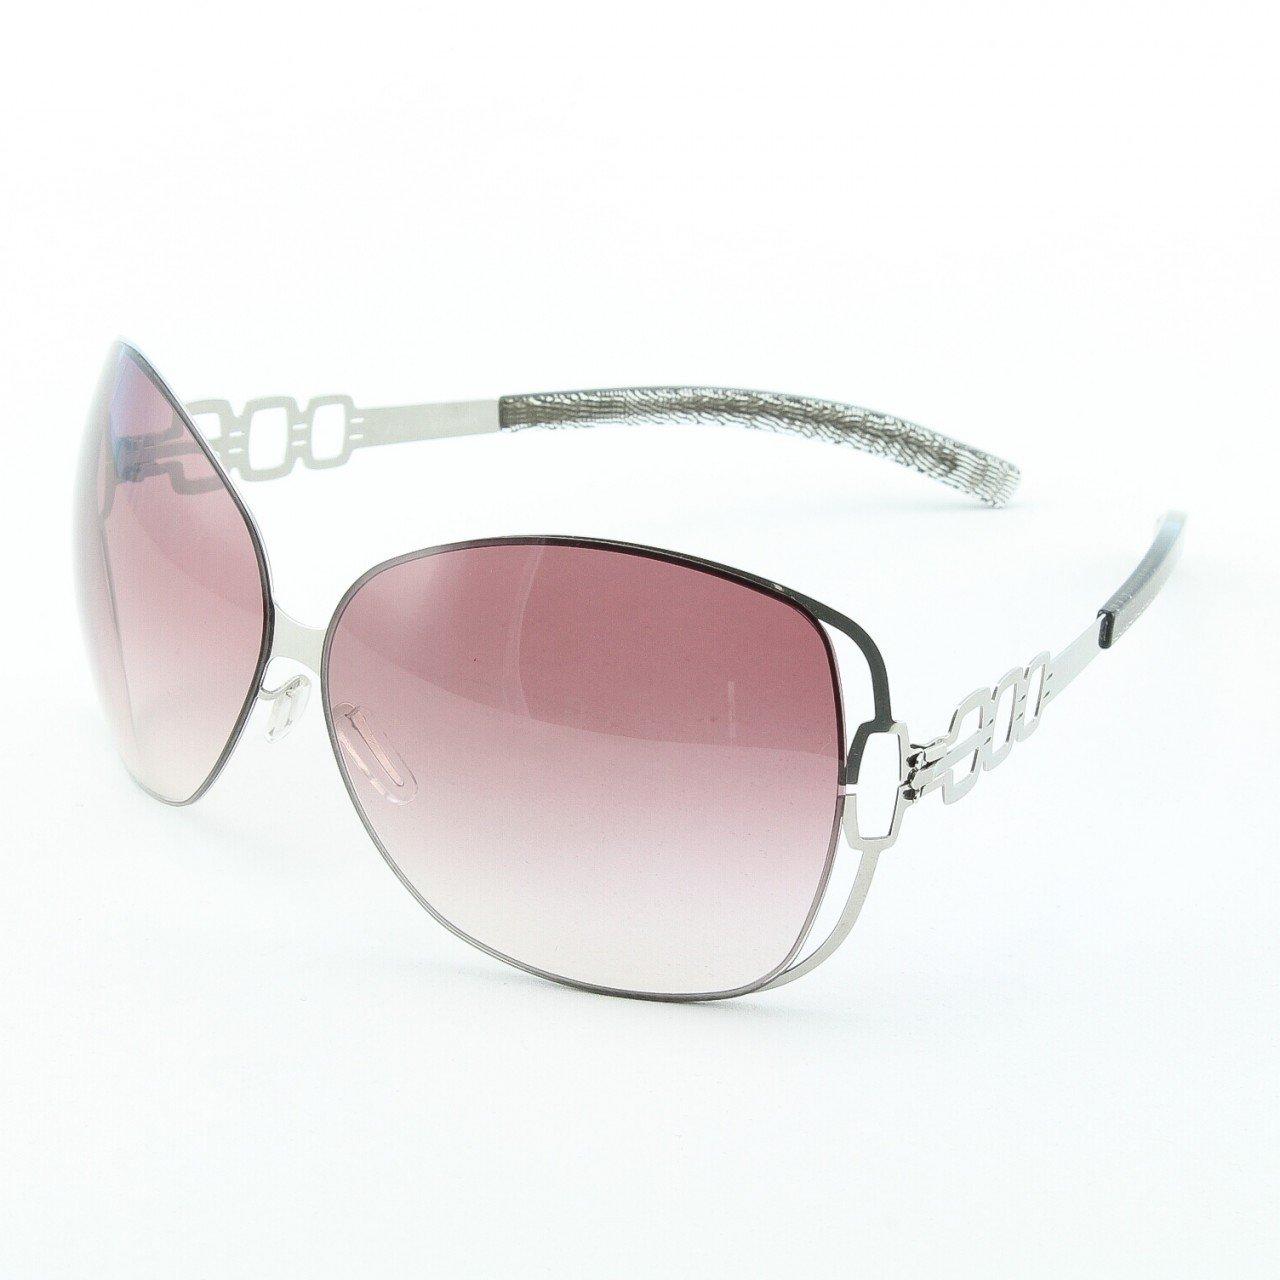 ic! Berlin Vendredi Sunglasses Col. Silver with Grey Lenses